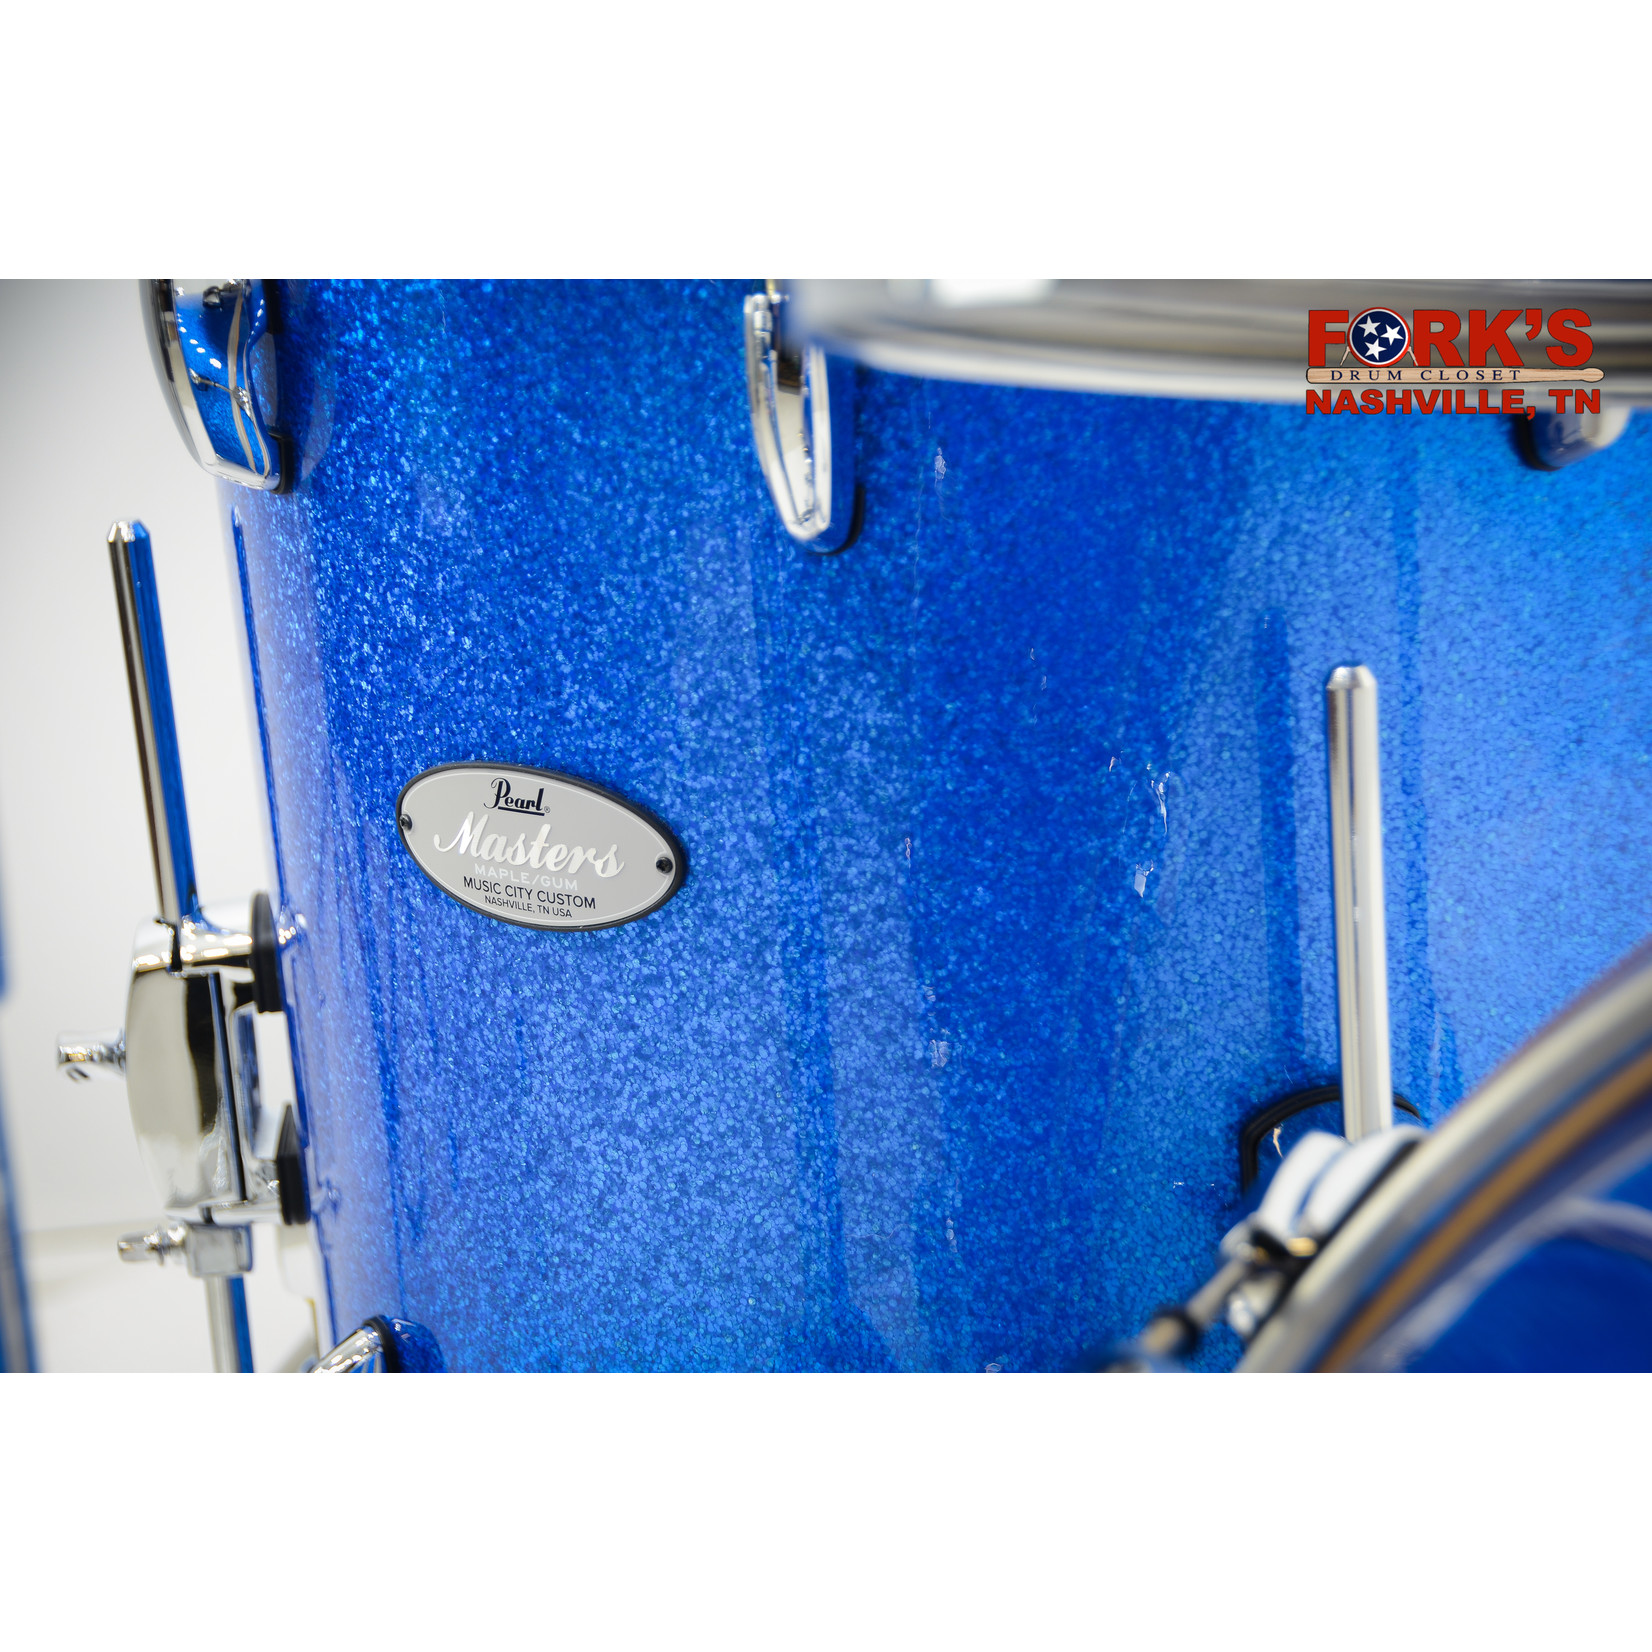 "Pearl Pearl Masters Maple/Gum Music City Custom 5pc Drum Kit ""Vintage Blue Glass"""